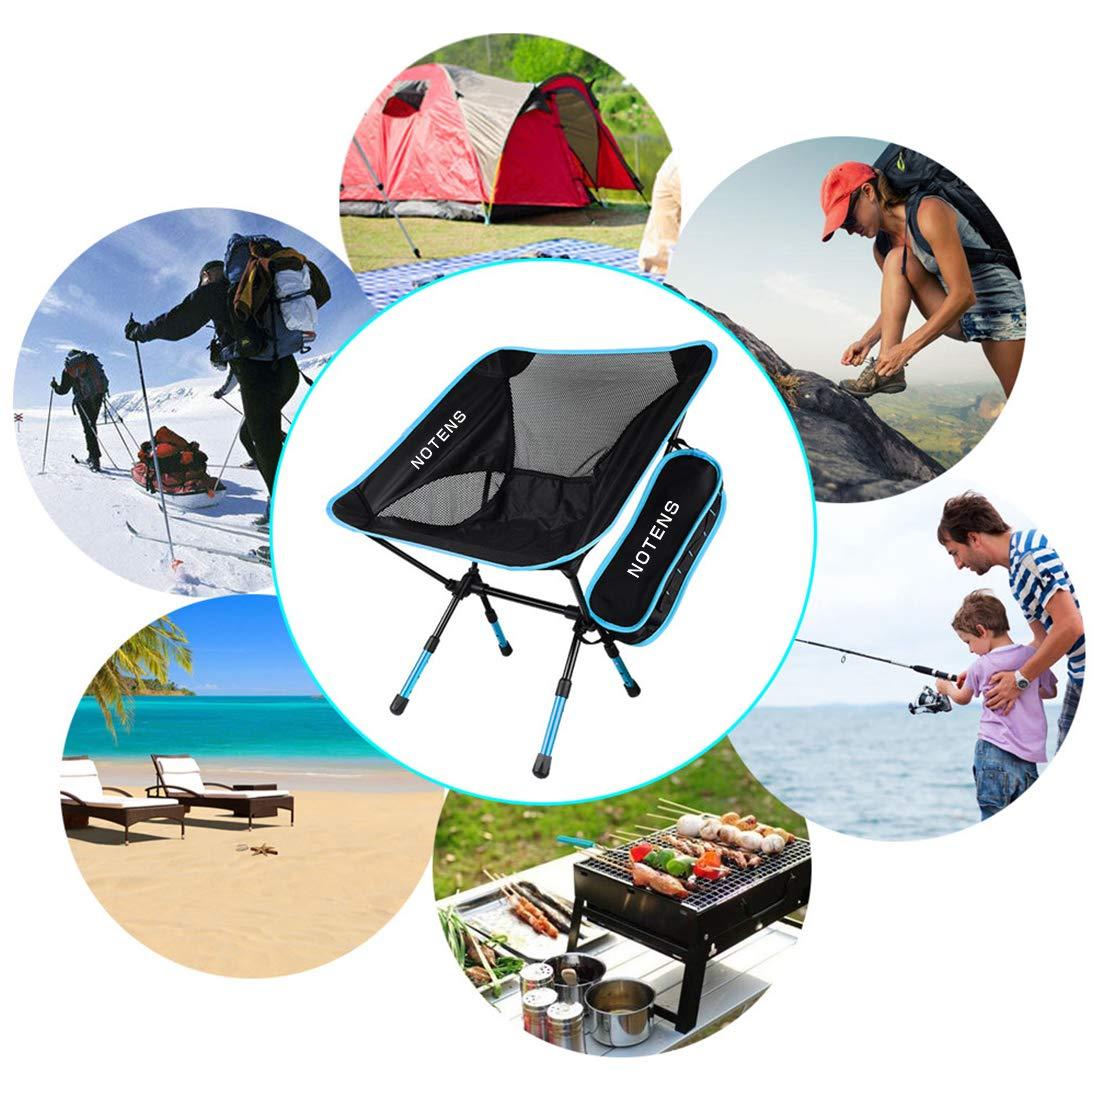 NOTENS Silla de Camping Plegable Ultraligero Mochilas al Aire Libre para recreo